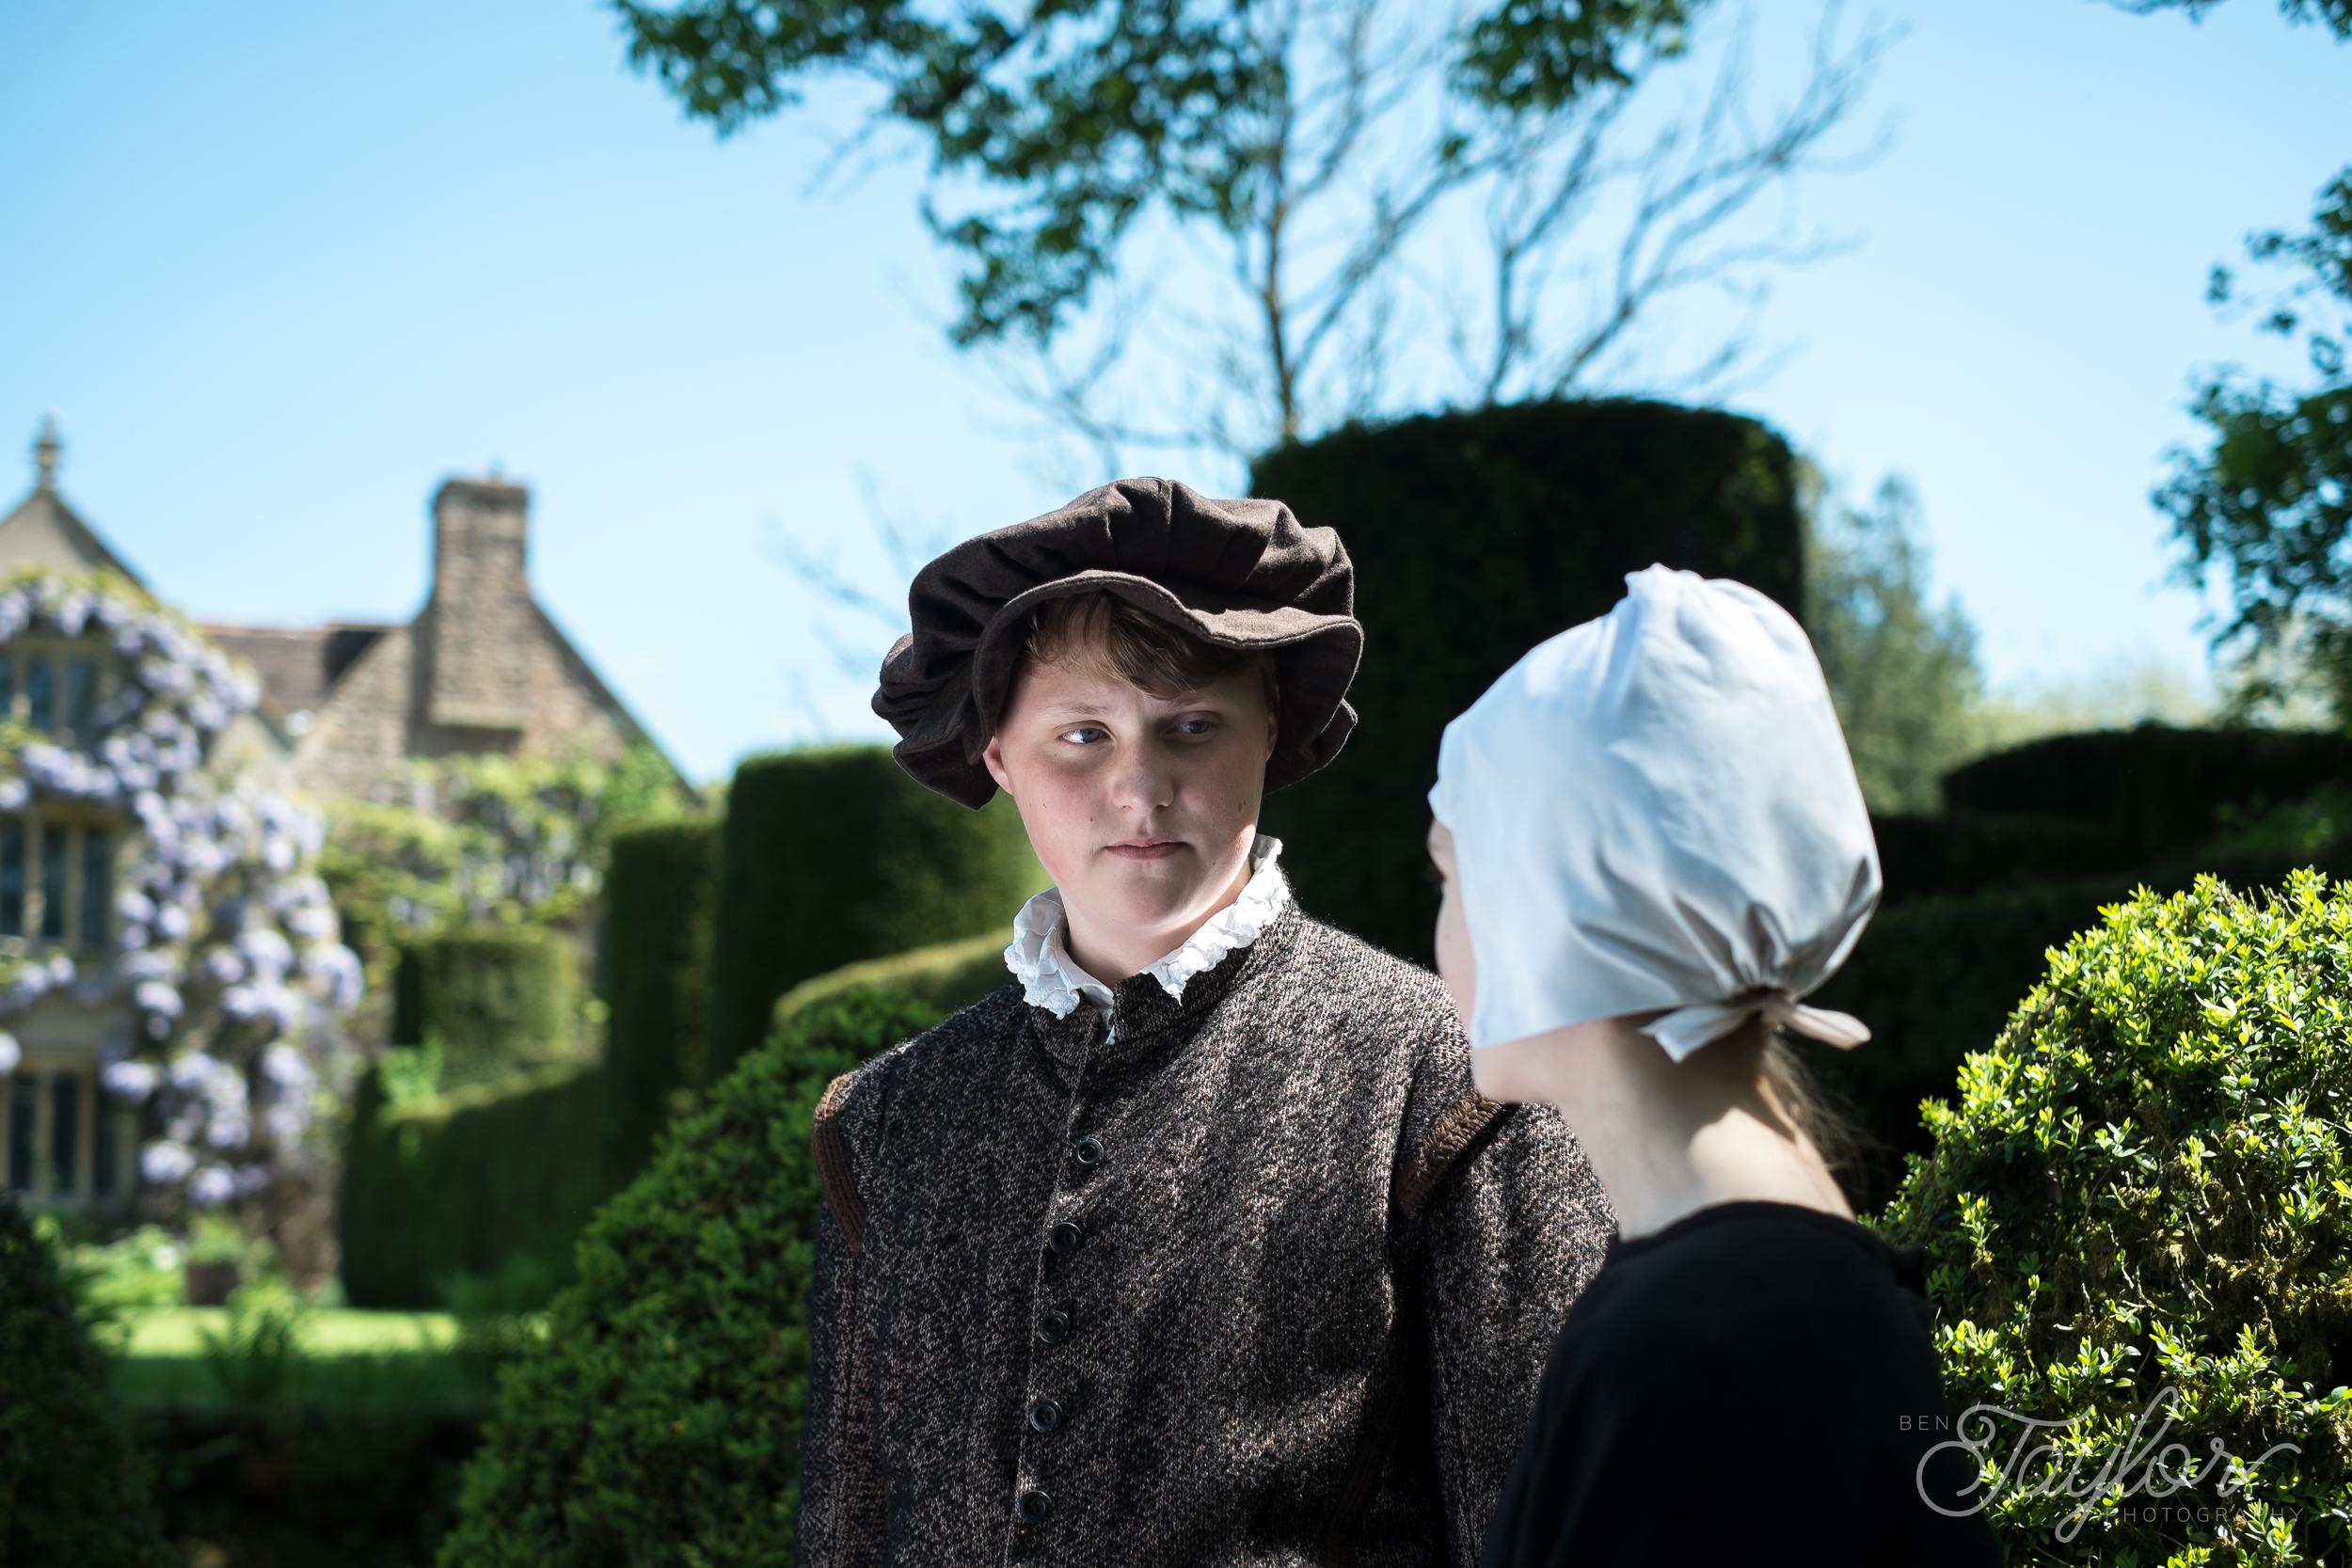 Cothay Manor Shoot-112.jpg